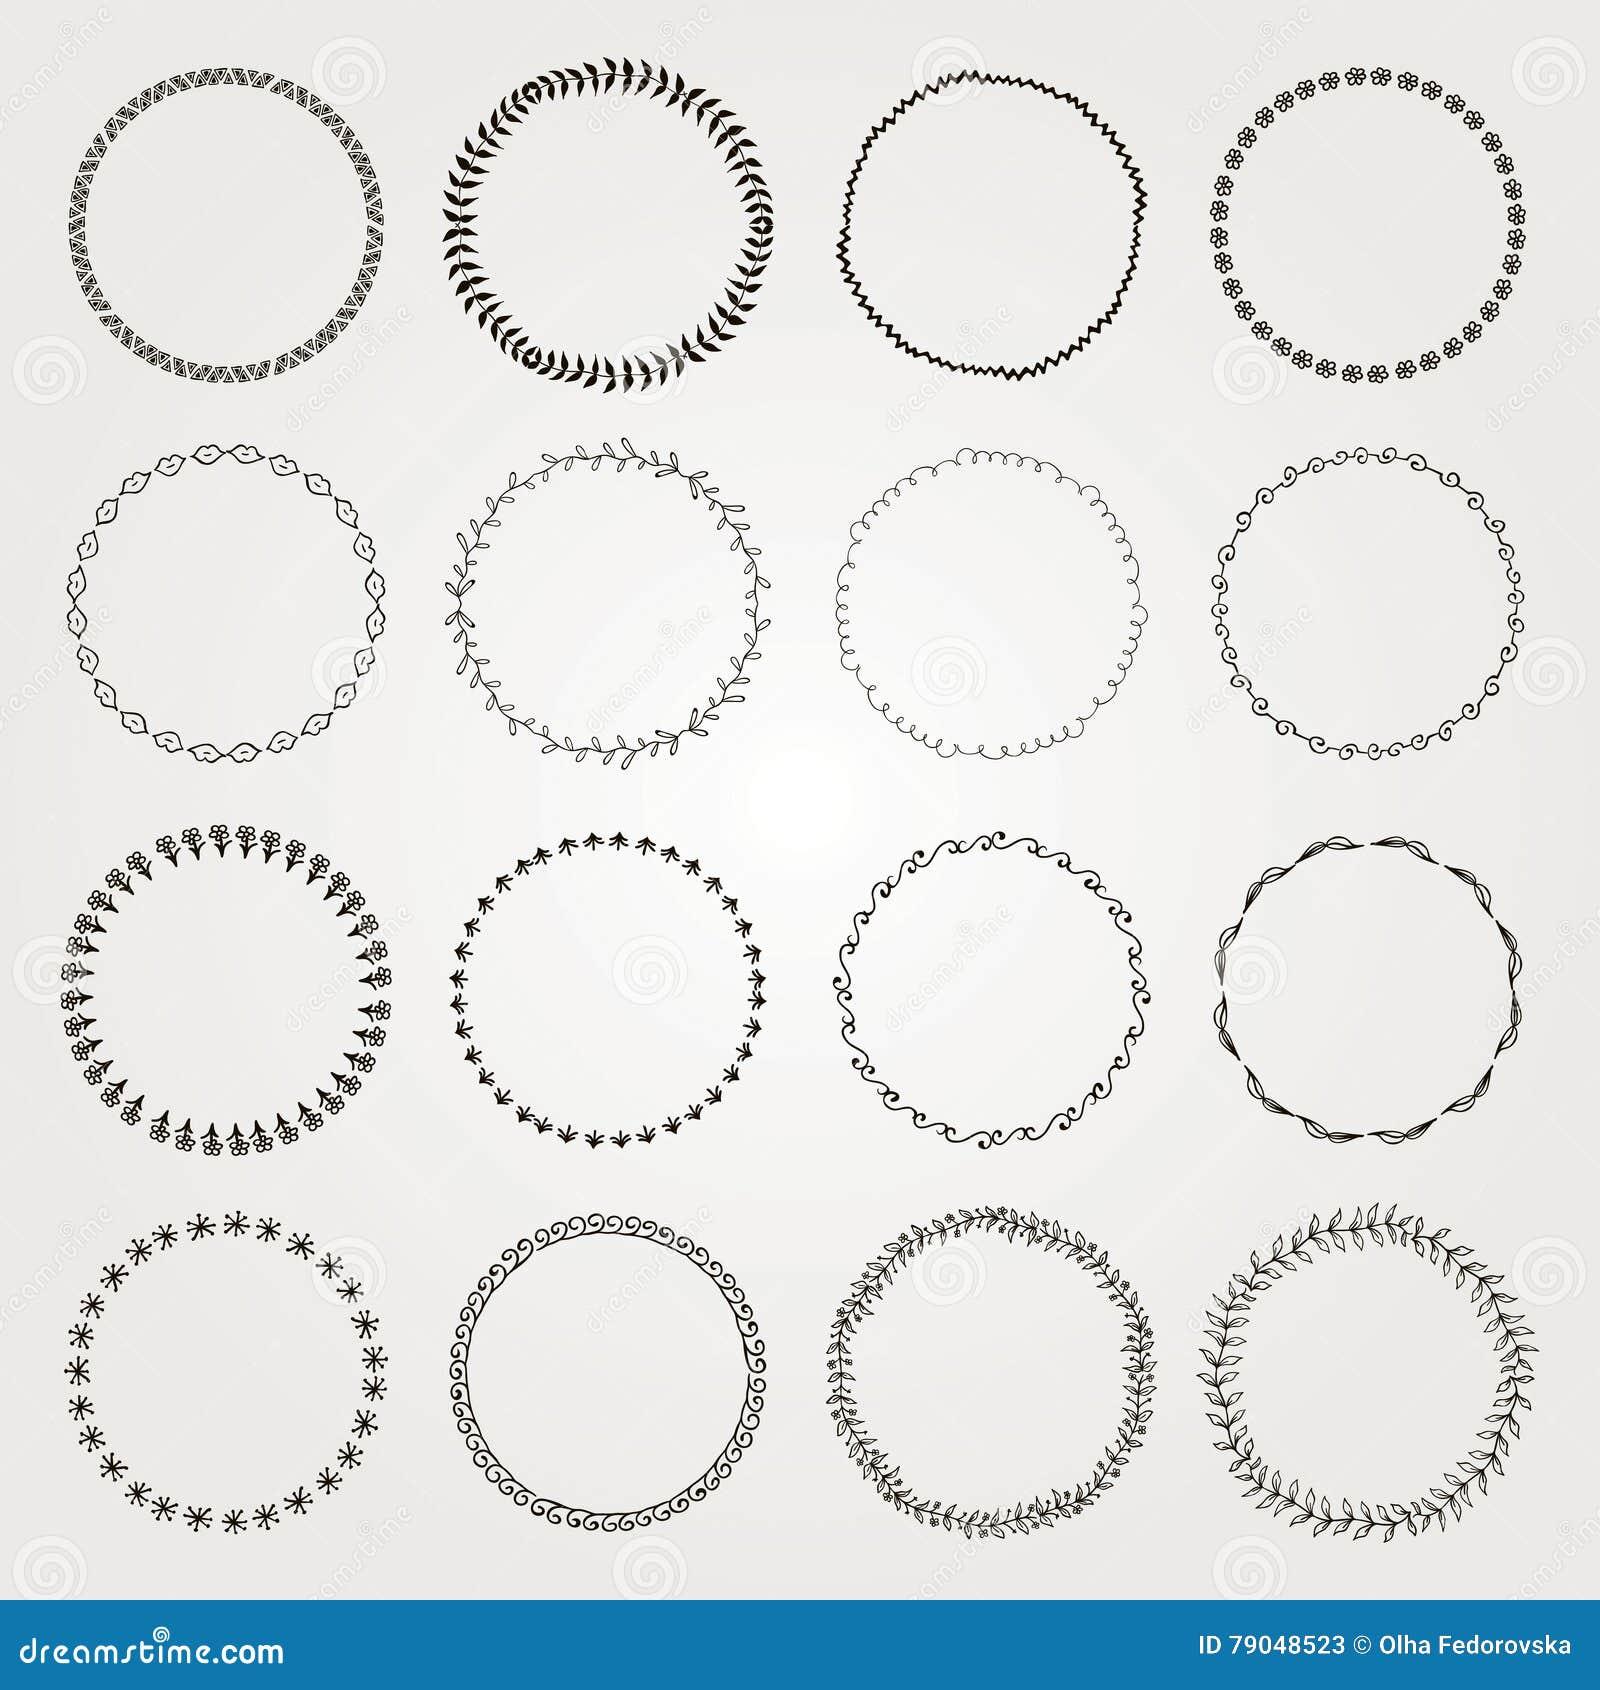 Set Of Hand Drawn Black Doodle Circle Logo Badge Elements Borders Frames Rustic Decorative Design Florals